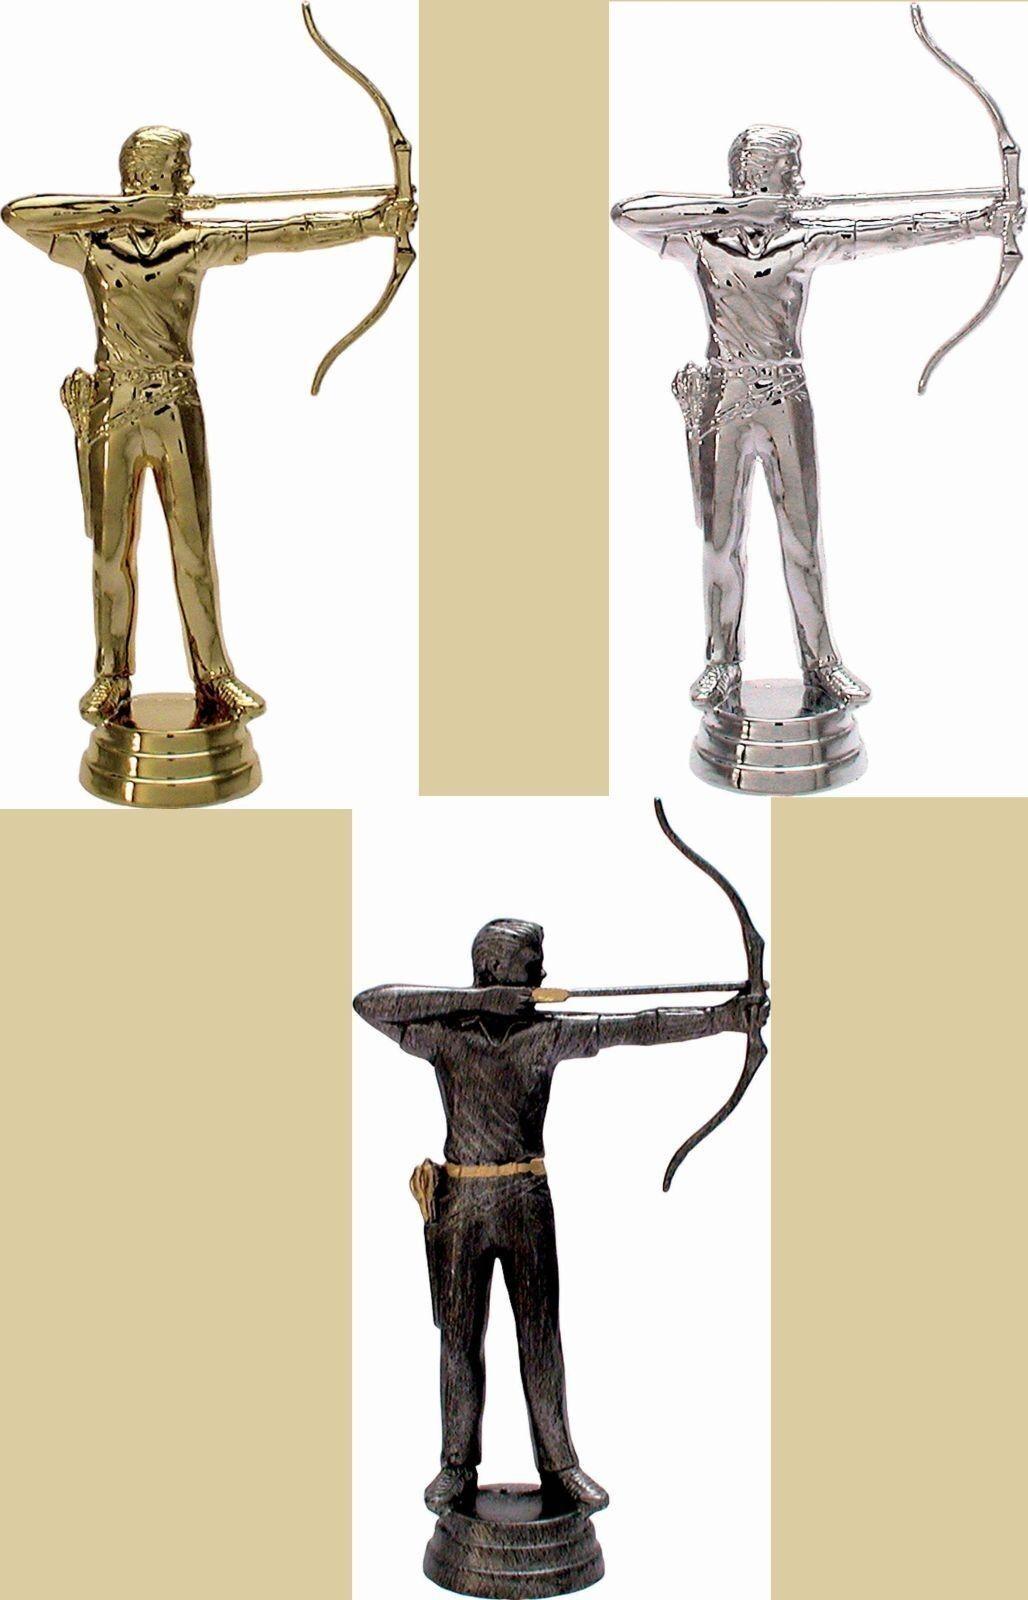 15 figuras projoeger arco Sagitario 3d con mármol zócalo (trofeos tiradores deportivos)